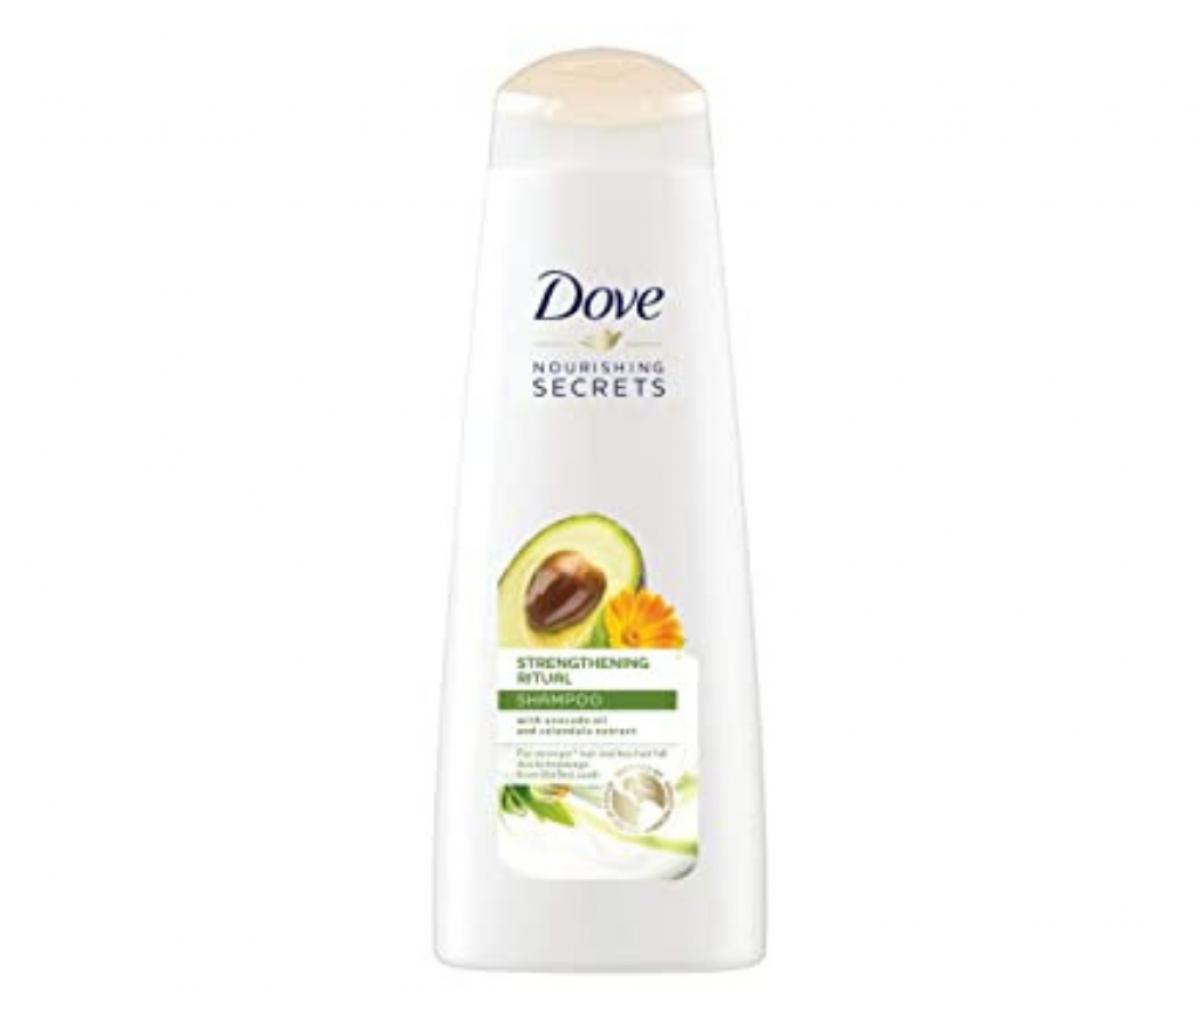 Dove 250ml Strenghtening Ritual Shampoo